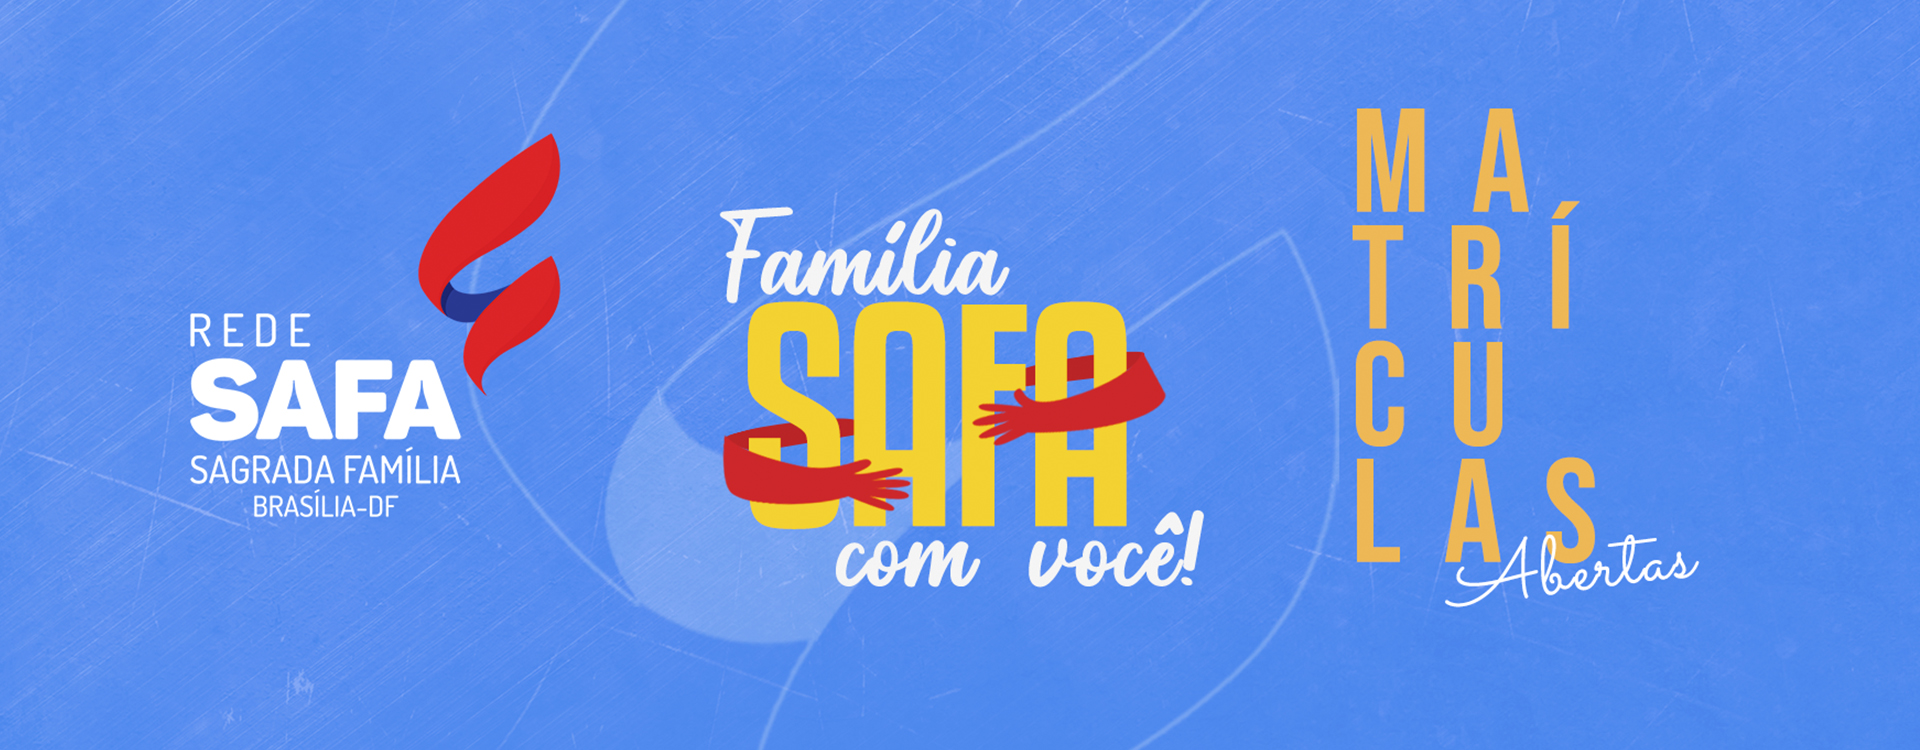 https://safa.com.br/site/wp-content/uploads/2020/10/Banner-site2.jpg